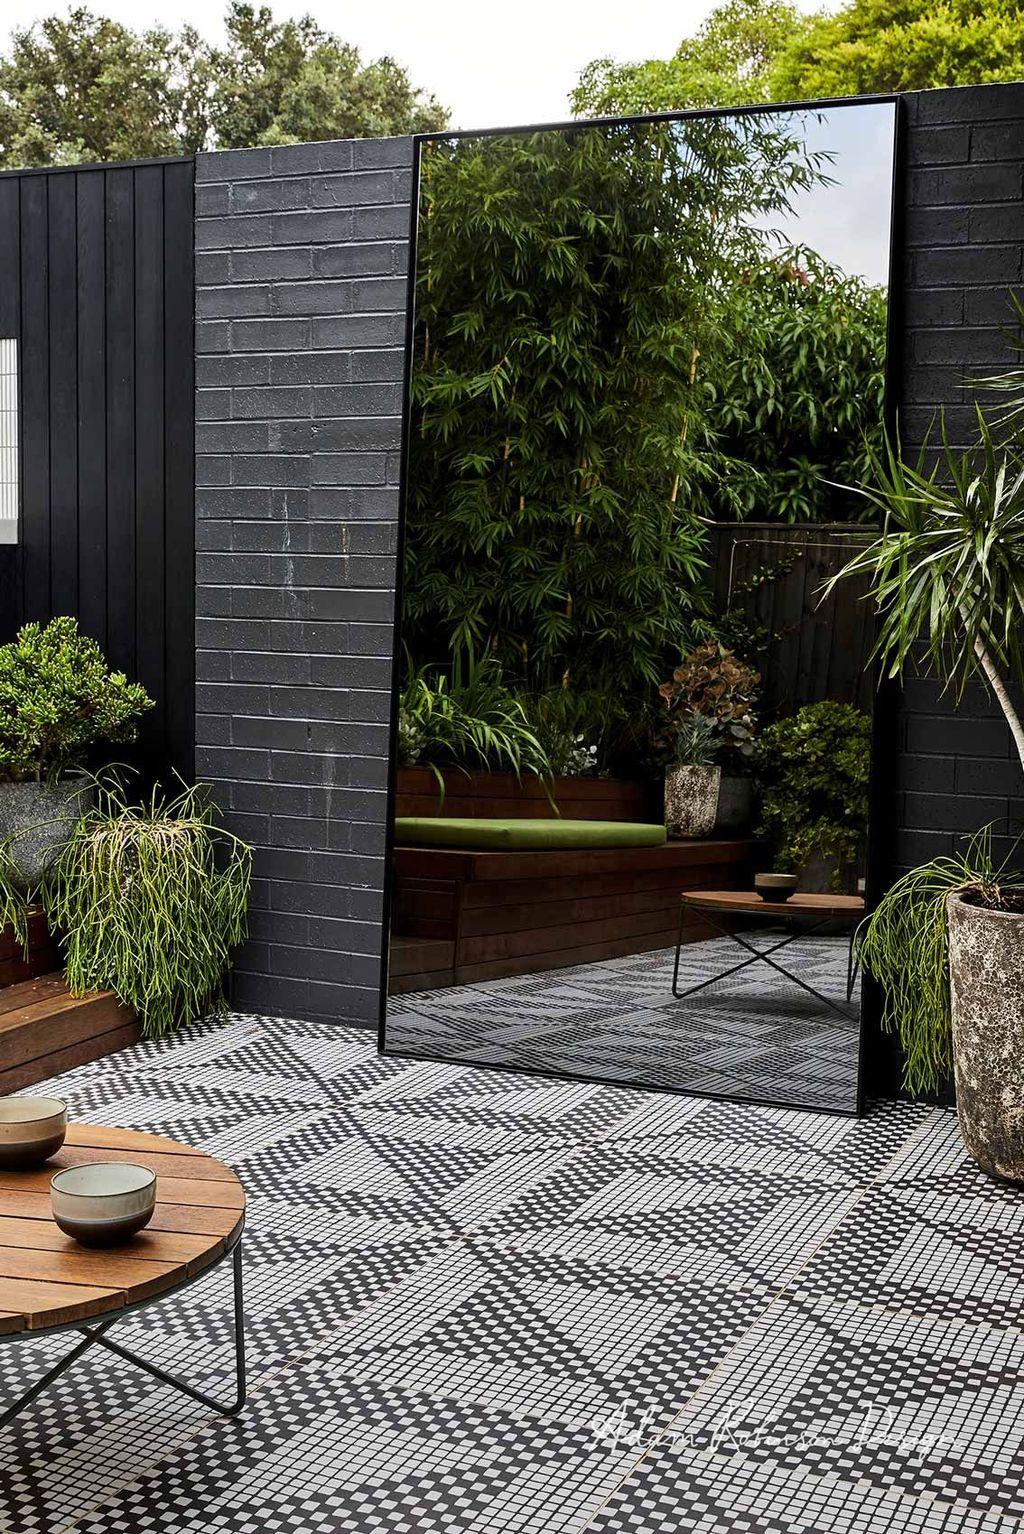 The Best Urban Garden Design Ideas For Your Backyard 02